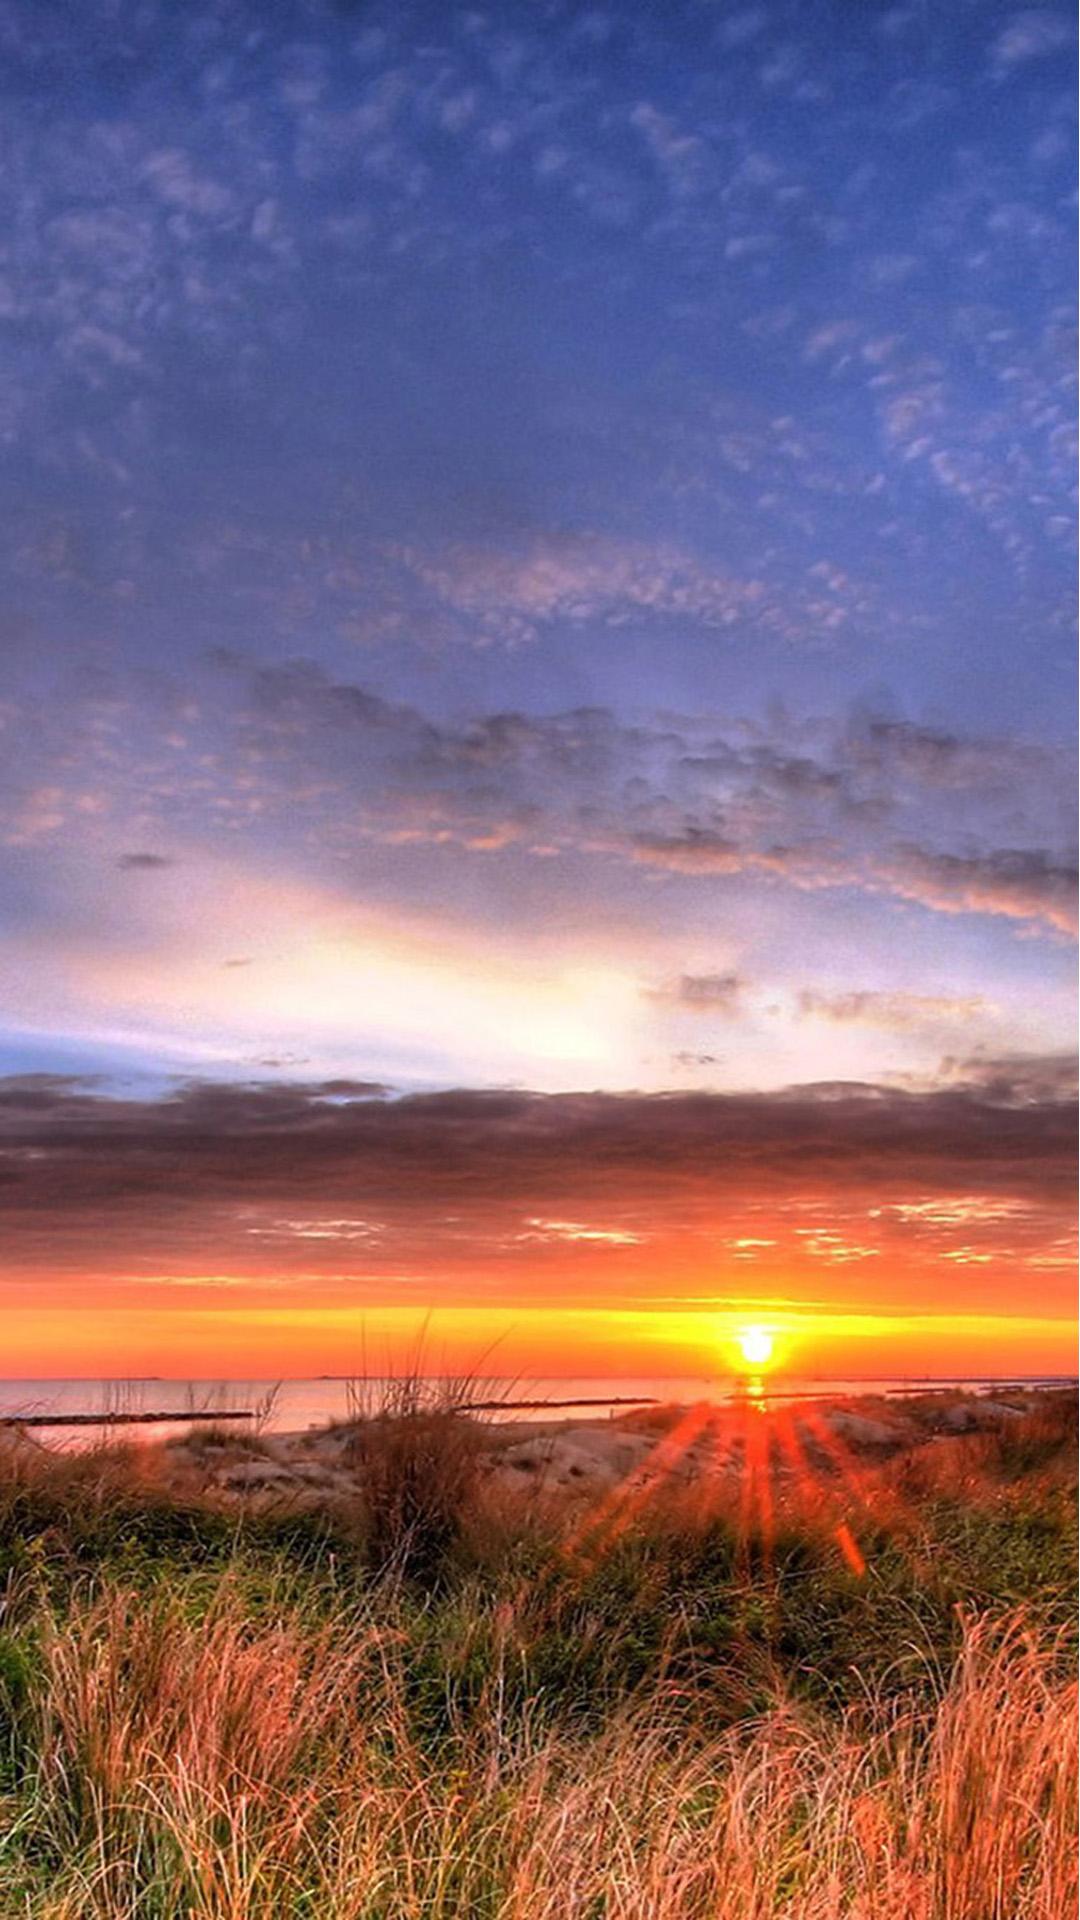 magnificent sunset on a beach house hd desktop background